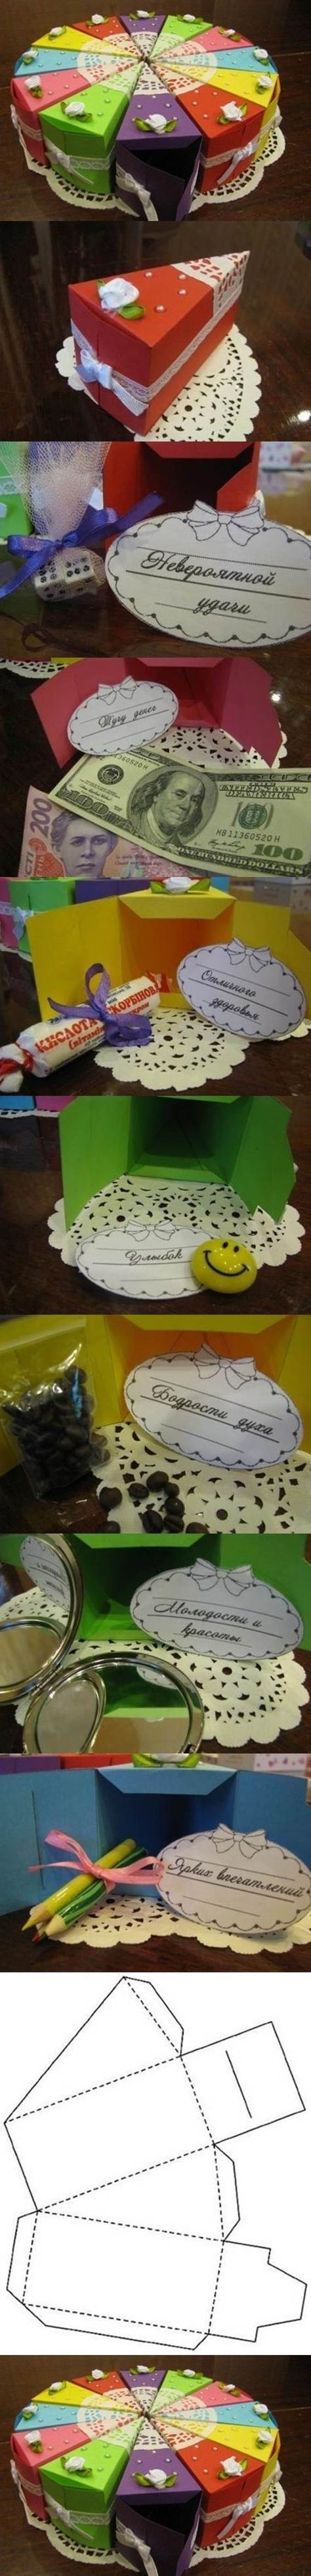 DIY Cake Shaped Gift Boxes   iCreativeIdeas.com Follow Us on Facebook --> https://www.facebook.com/iCreativeIdeas